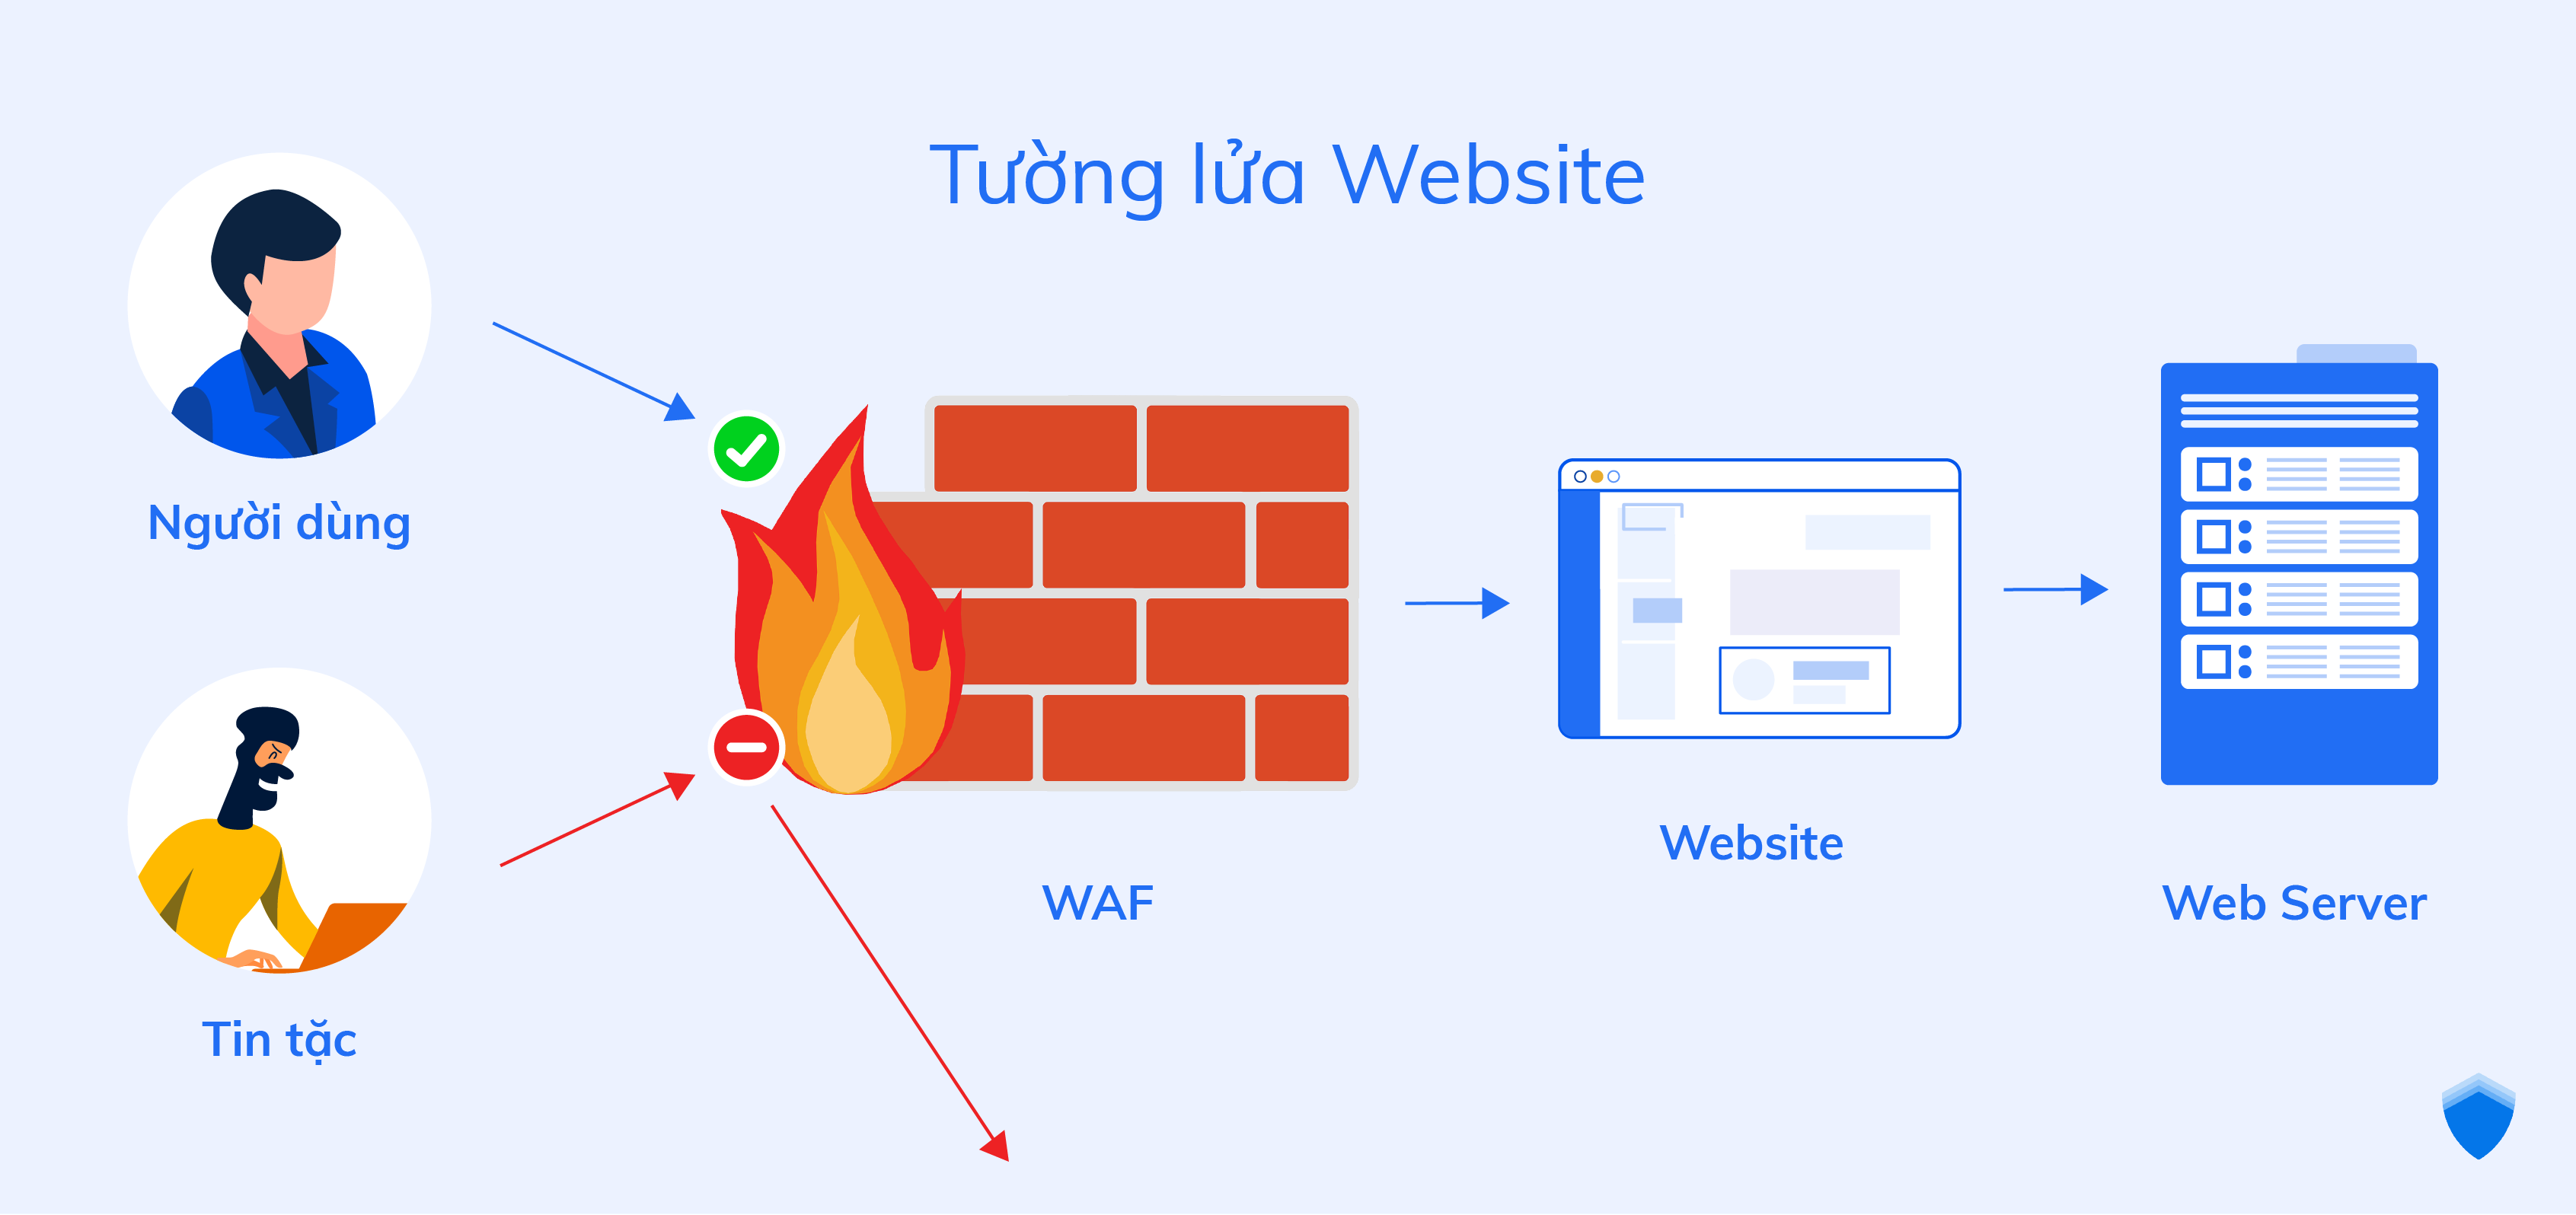 Bảo vệ website bằng Tường lửa